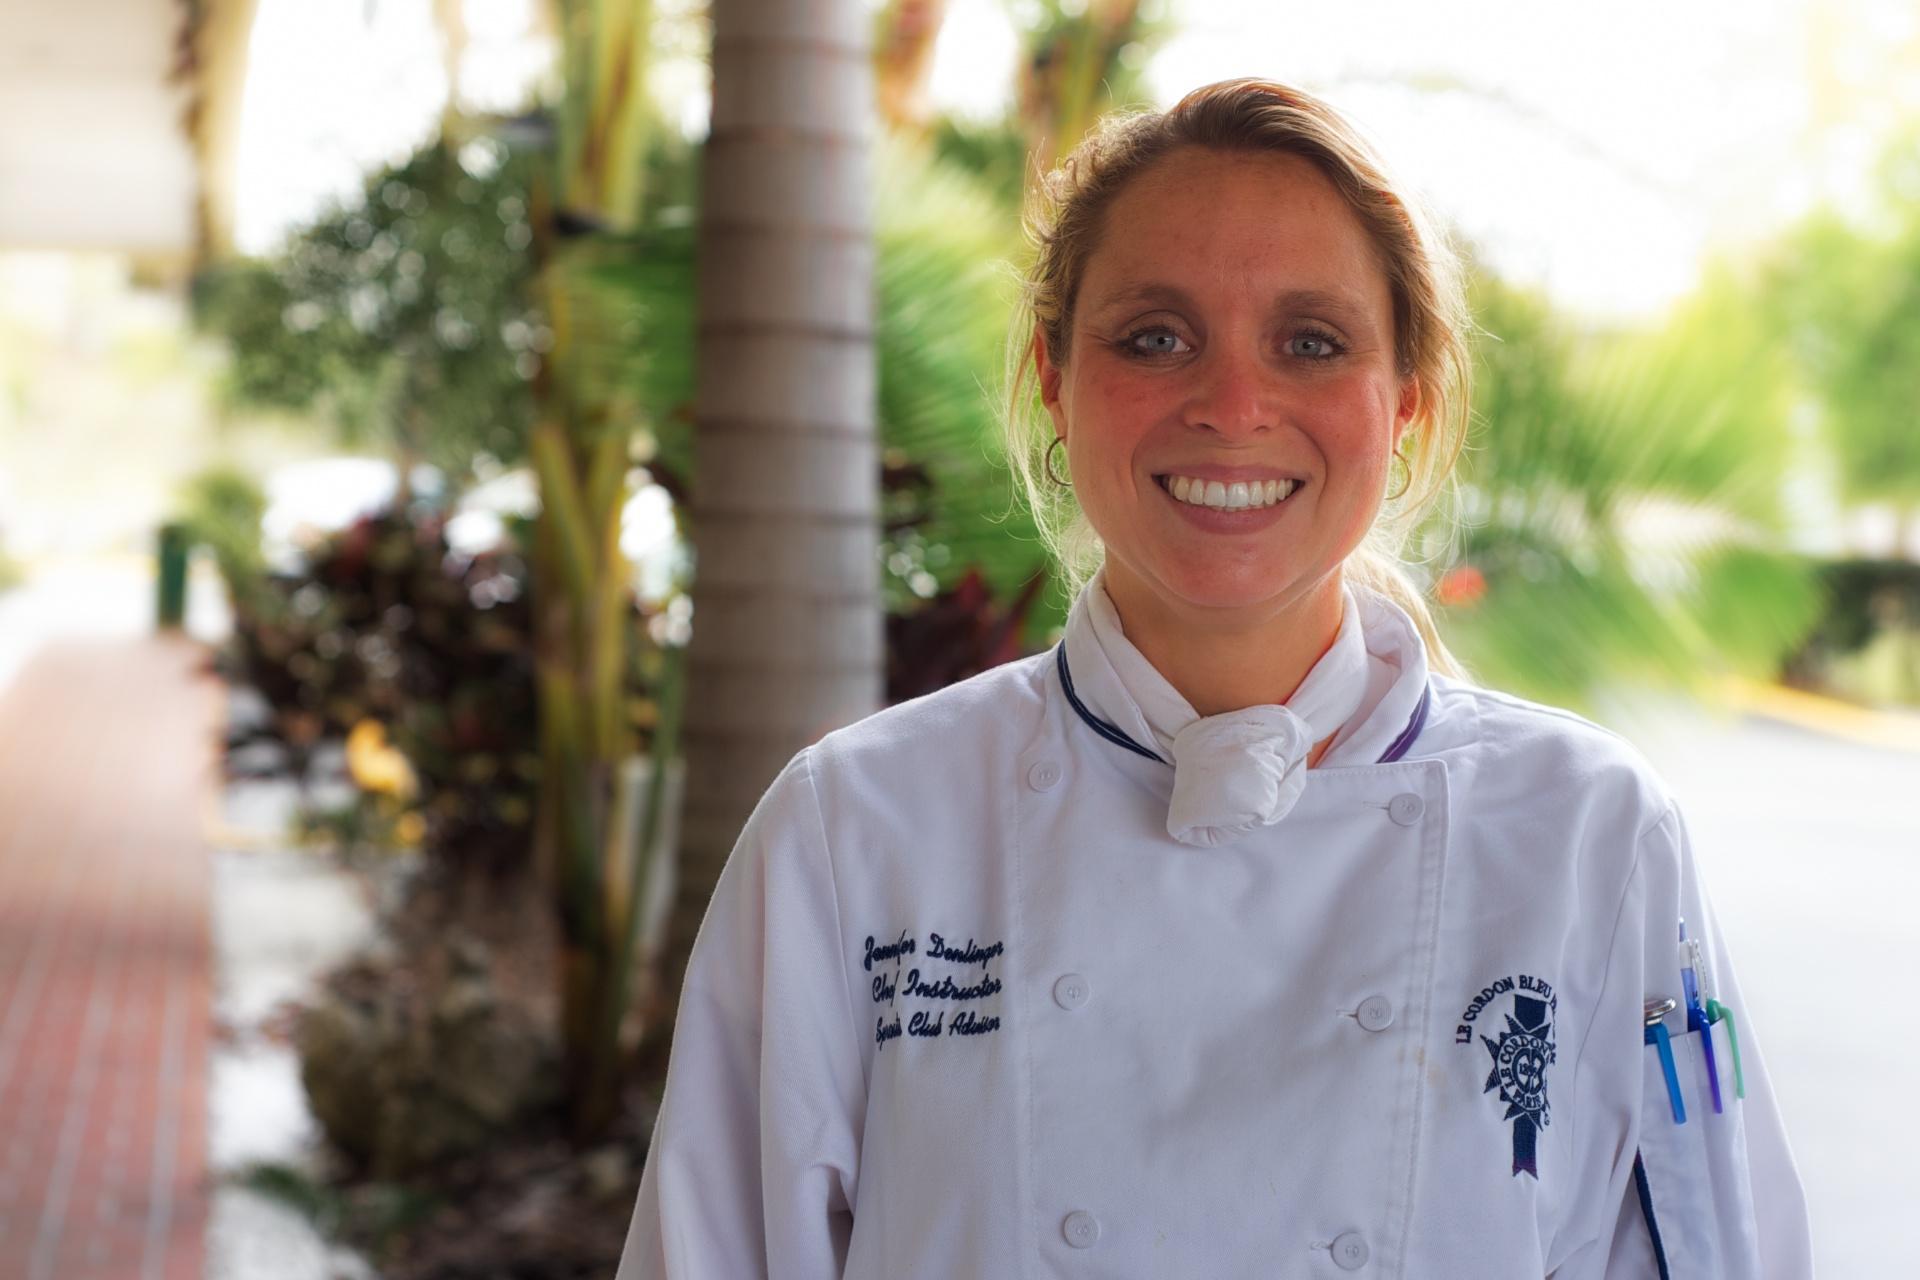 Chef Jennifer Denlinger at the 2010 Florida Strawberry Harvest Tour